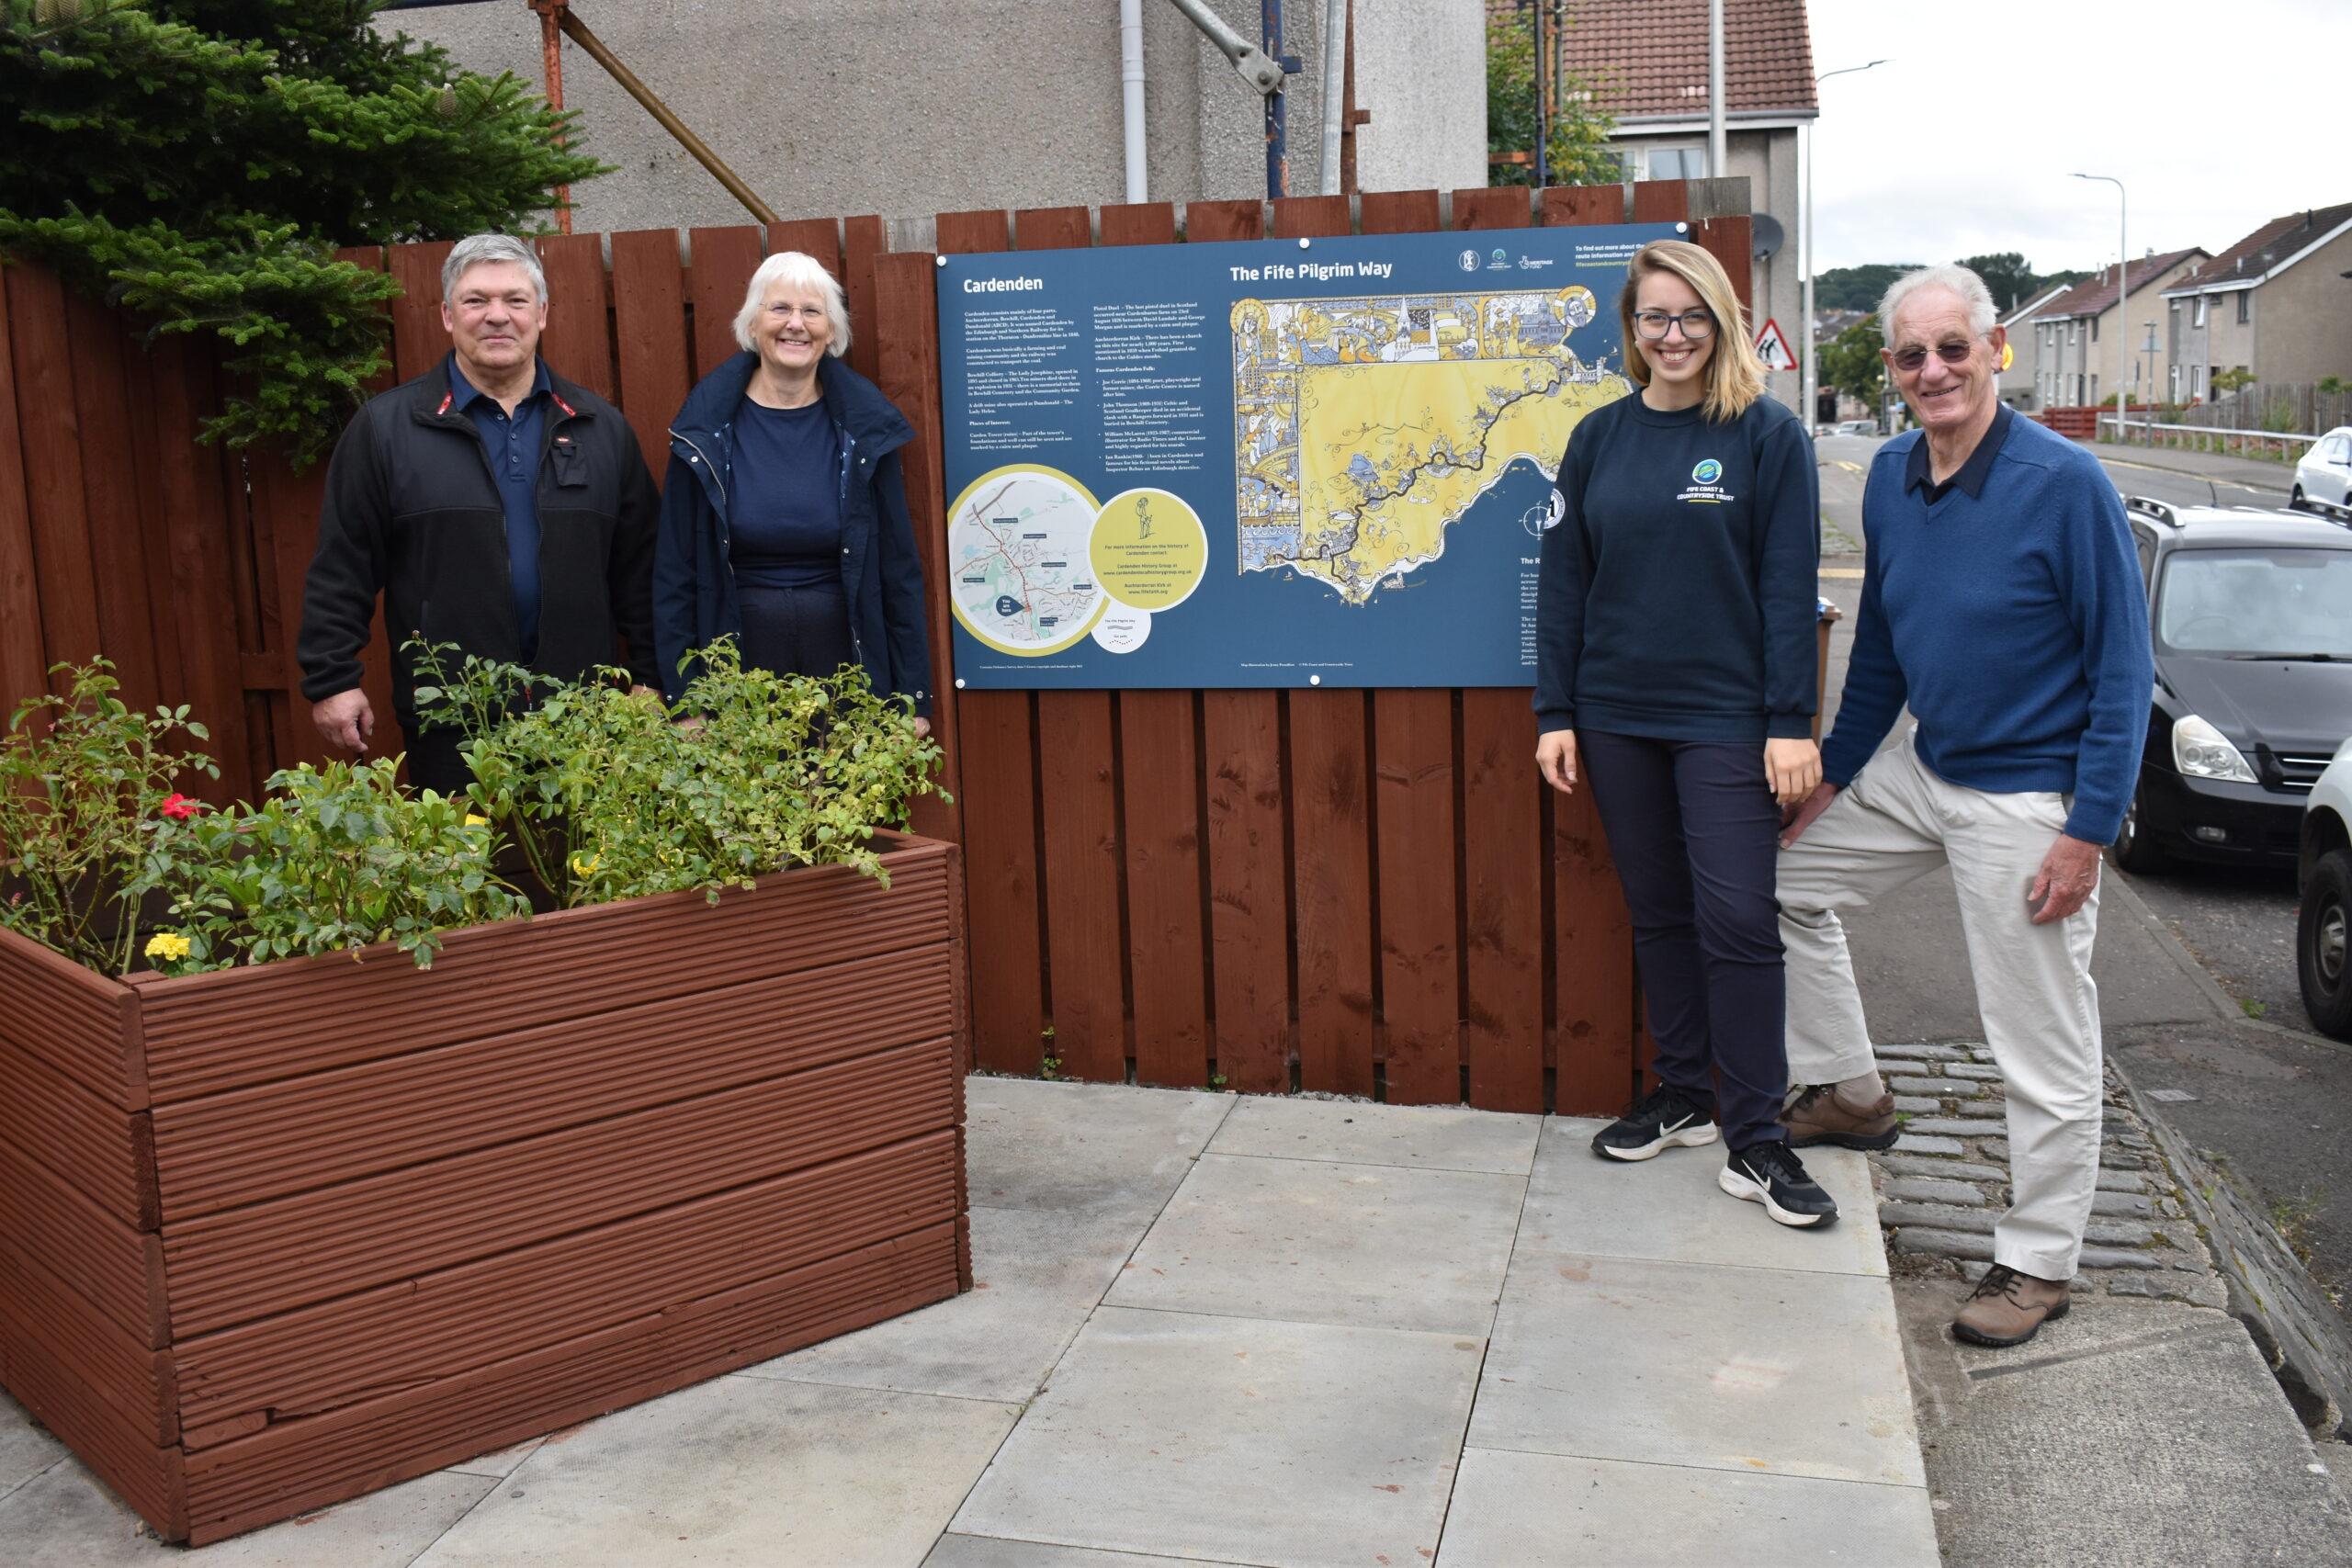 New Fife Pilgrim Way Interpretation Panel Unveiled in Cardenden.